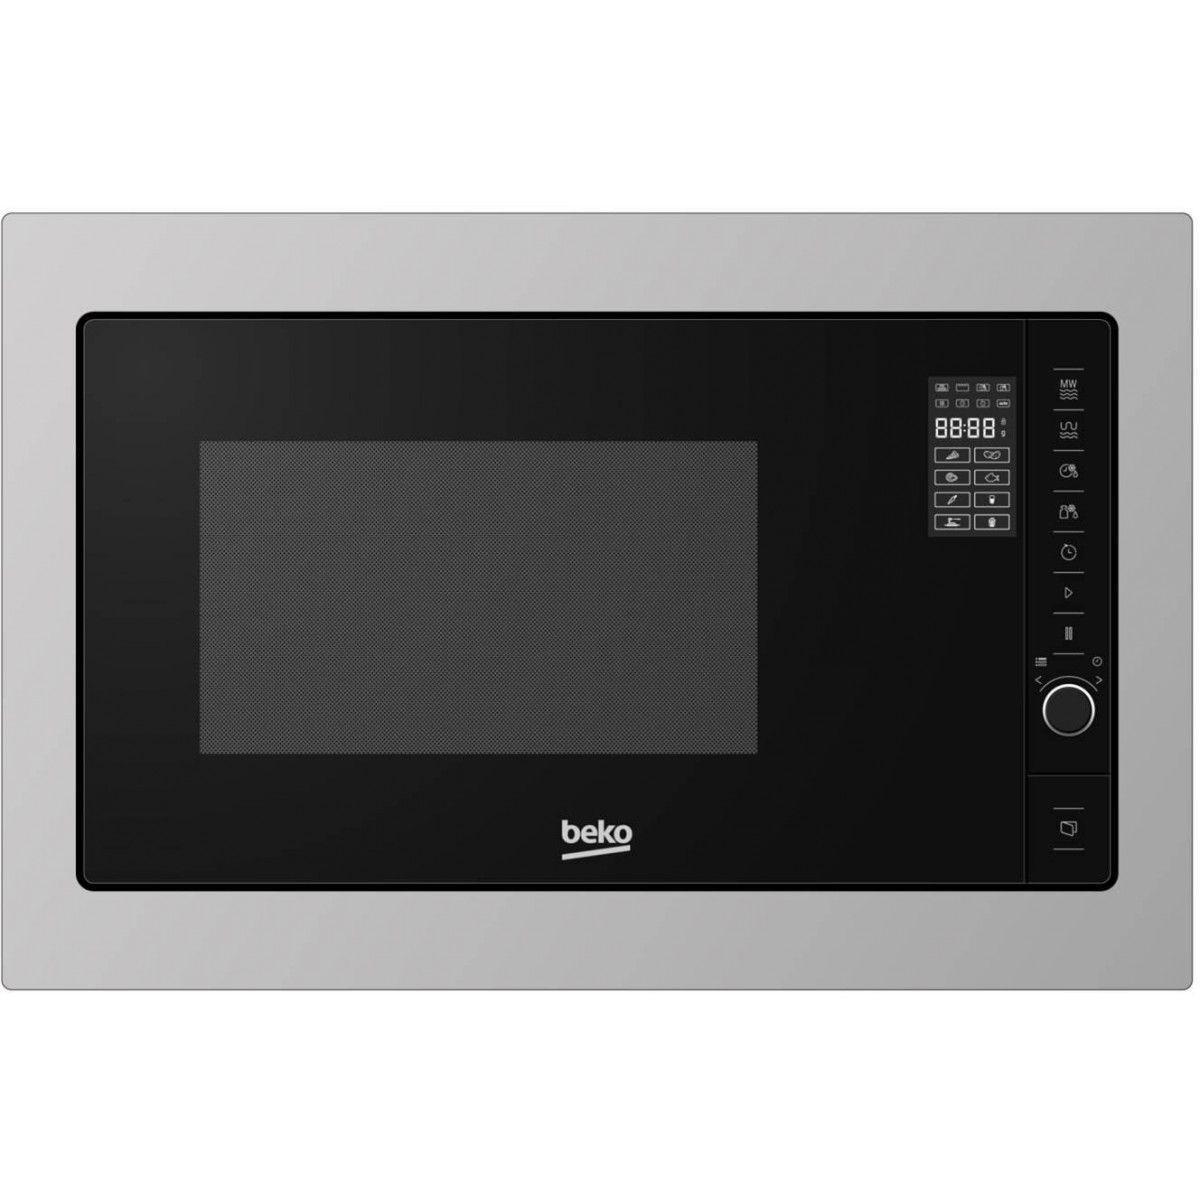 Beko Micro-ondes Encastrable 25l Beko 900w 59.5cm, 1104265